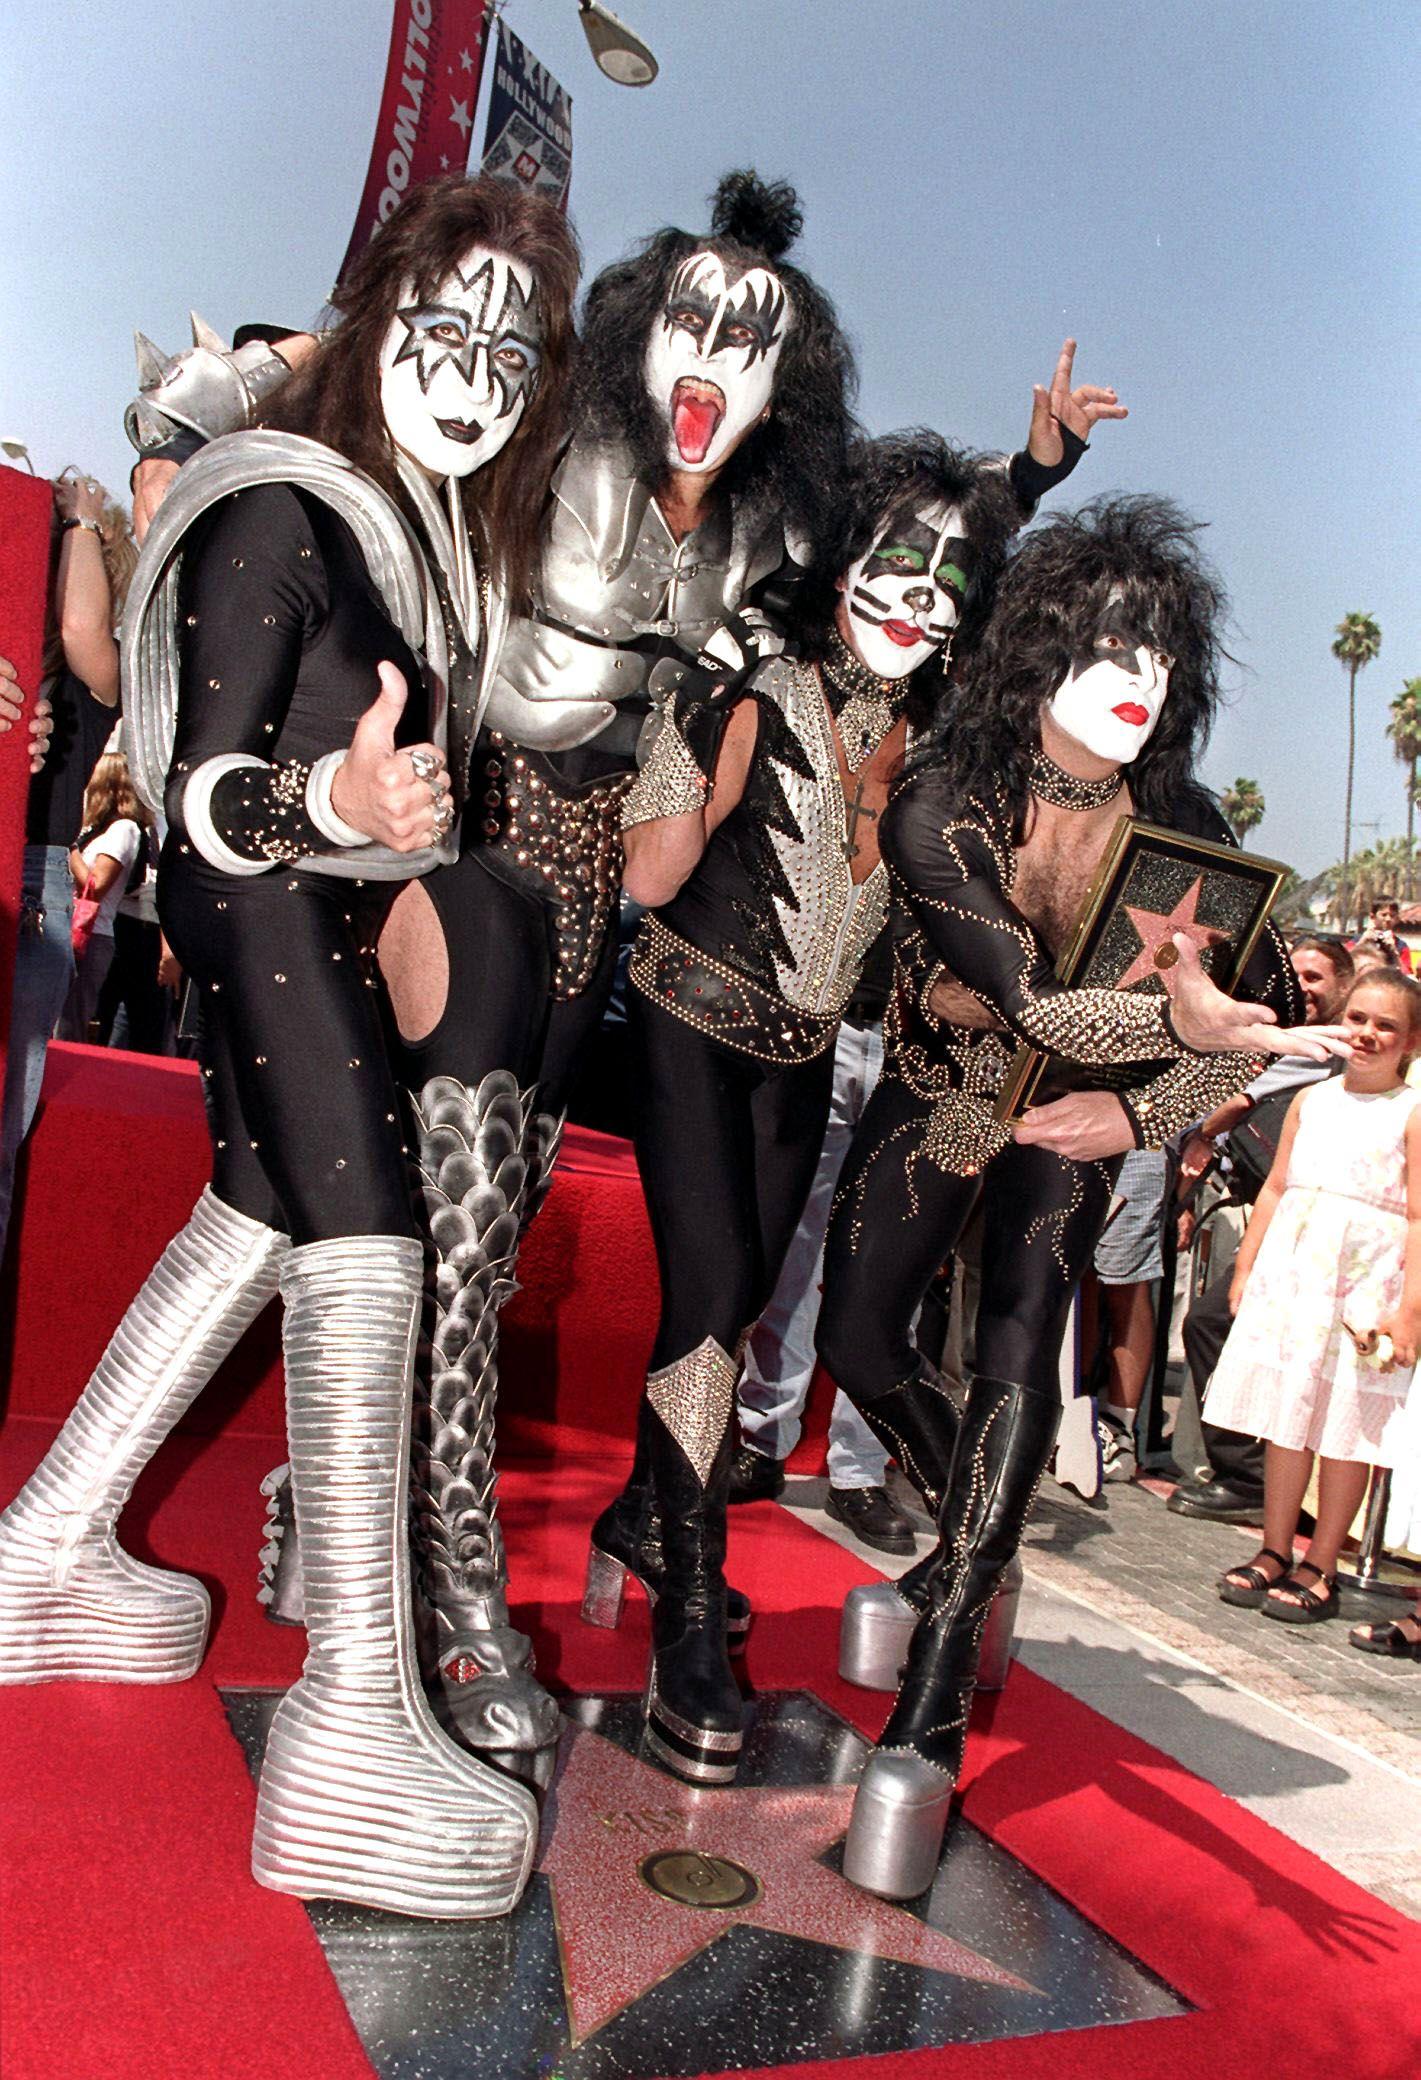 Kiss The Band Images 1283165535 Jpg 1421 2080 Kiss Band Kiss